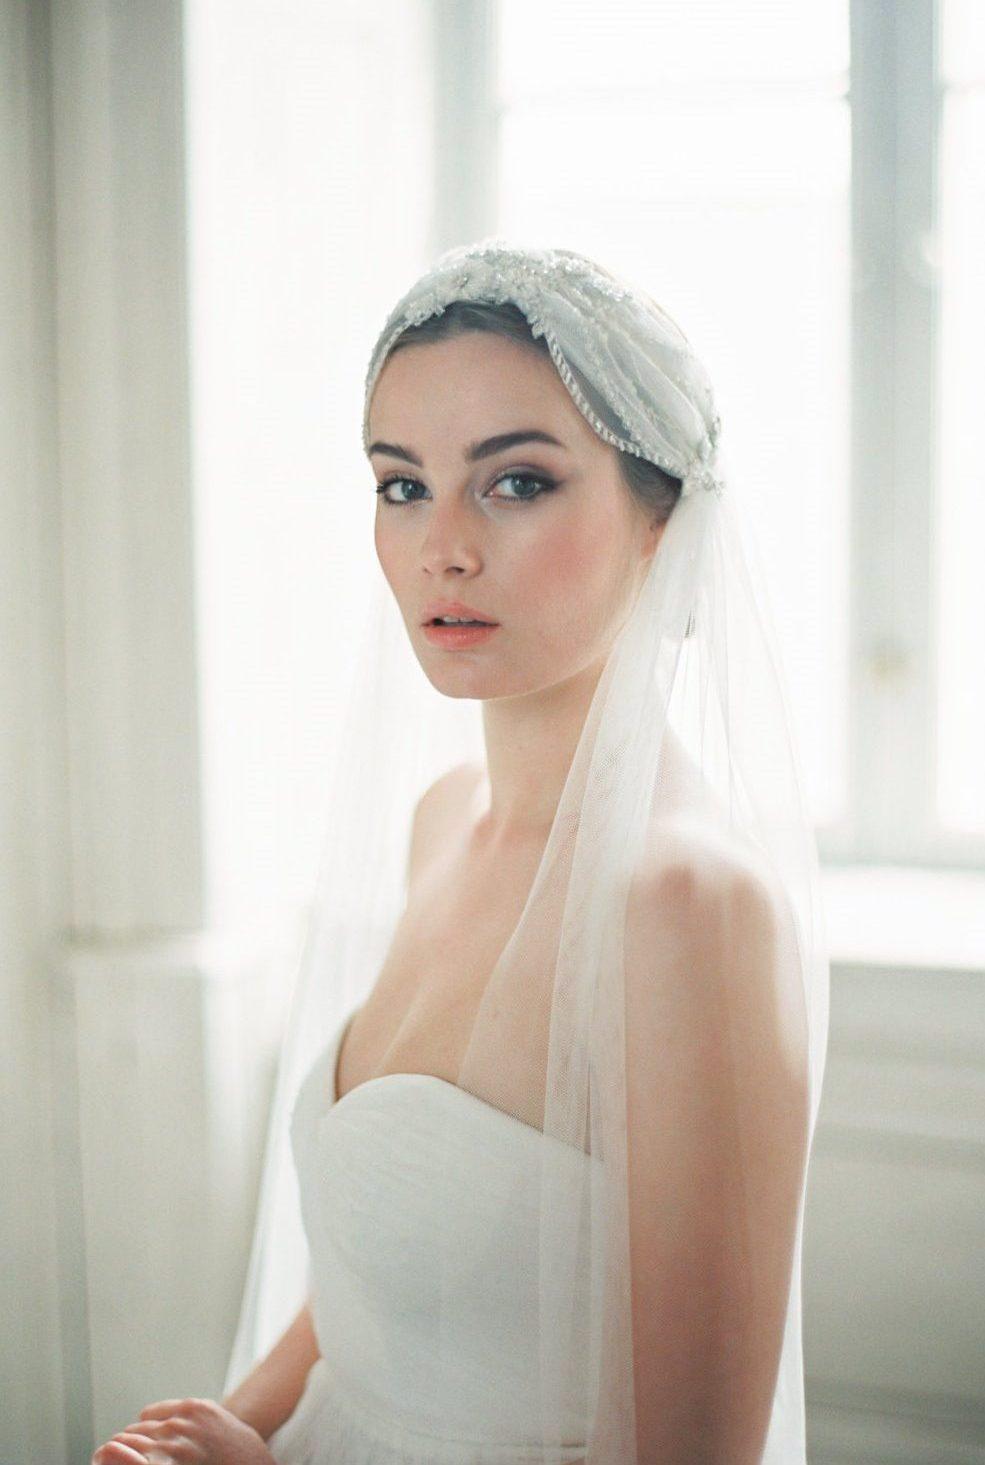 Veils & Hair Accessories Archives - Chic Vintage Brides : Chic ...